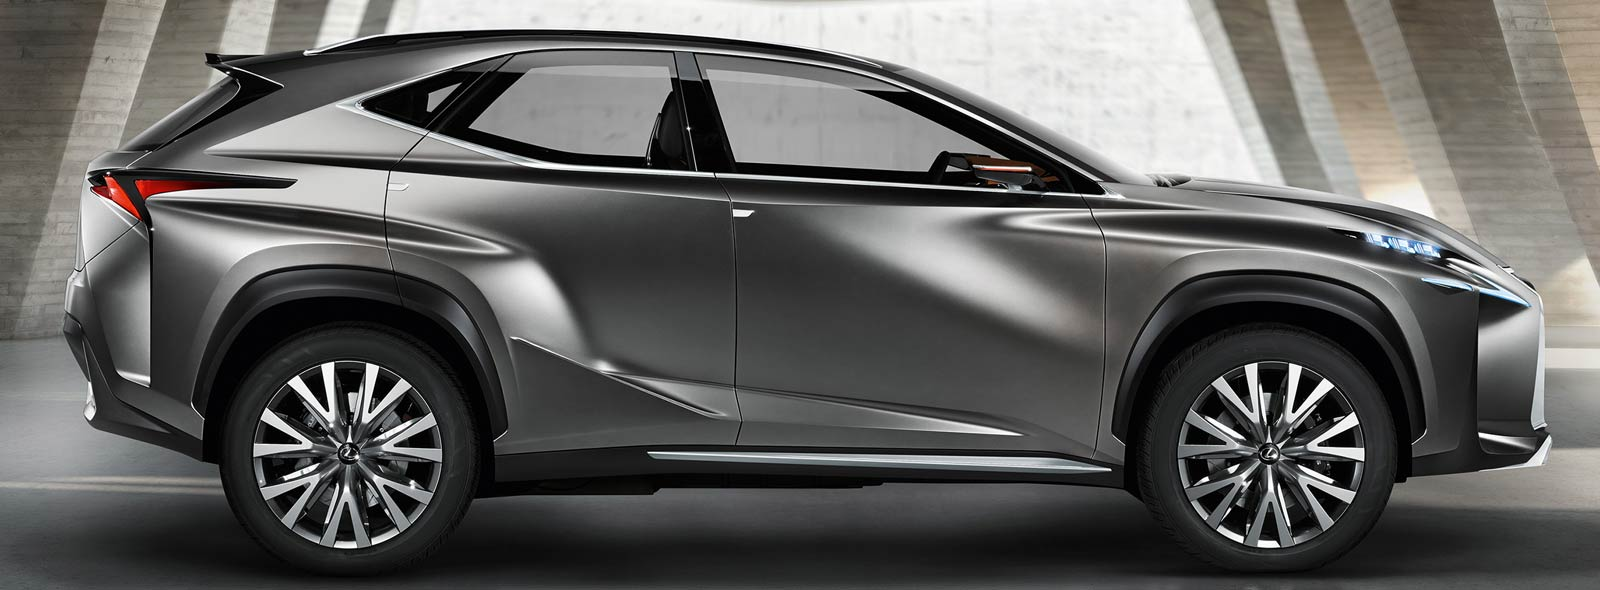 Lexus LF NX Կոնցեպտի տեսքը կողքից